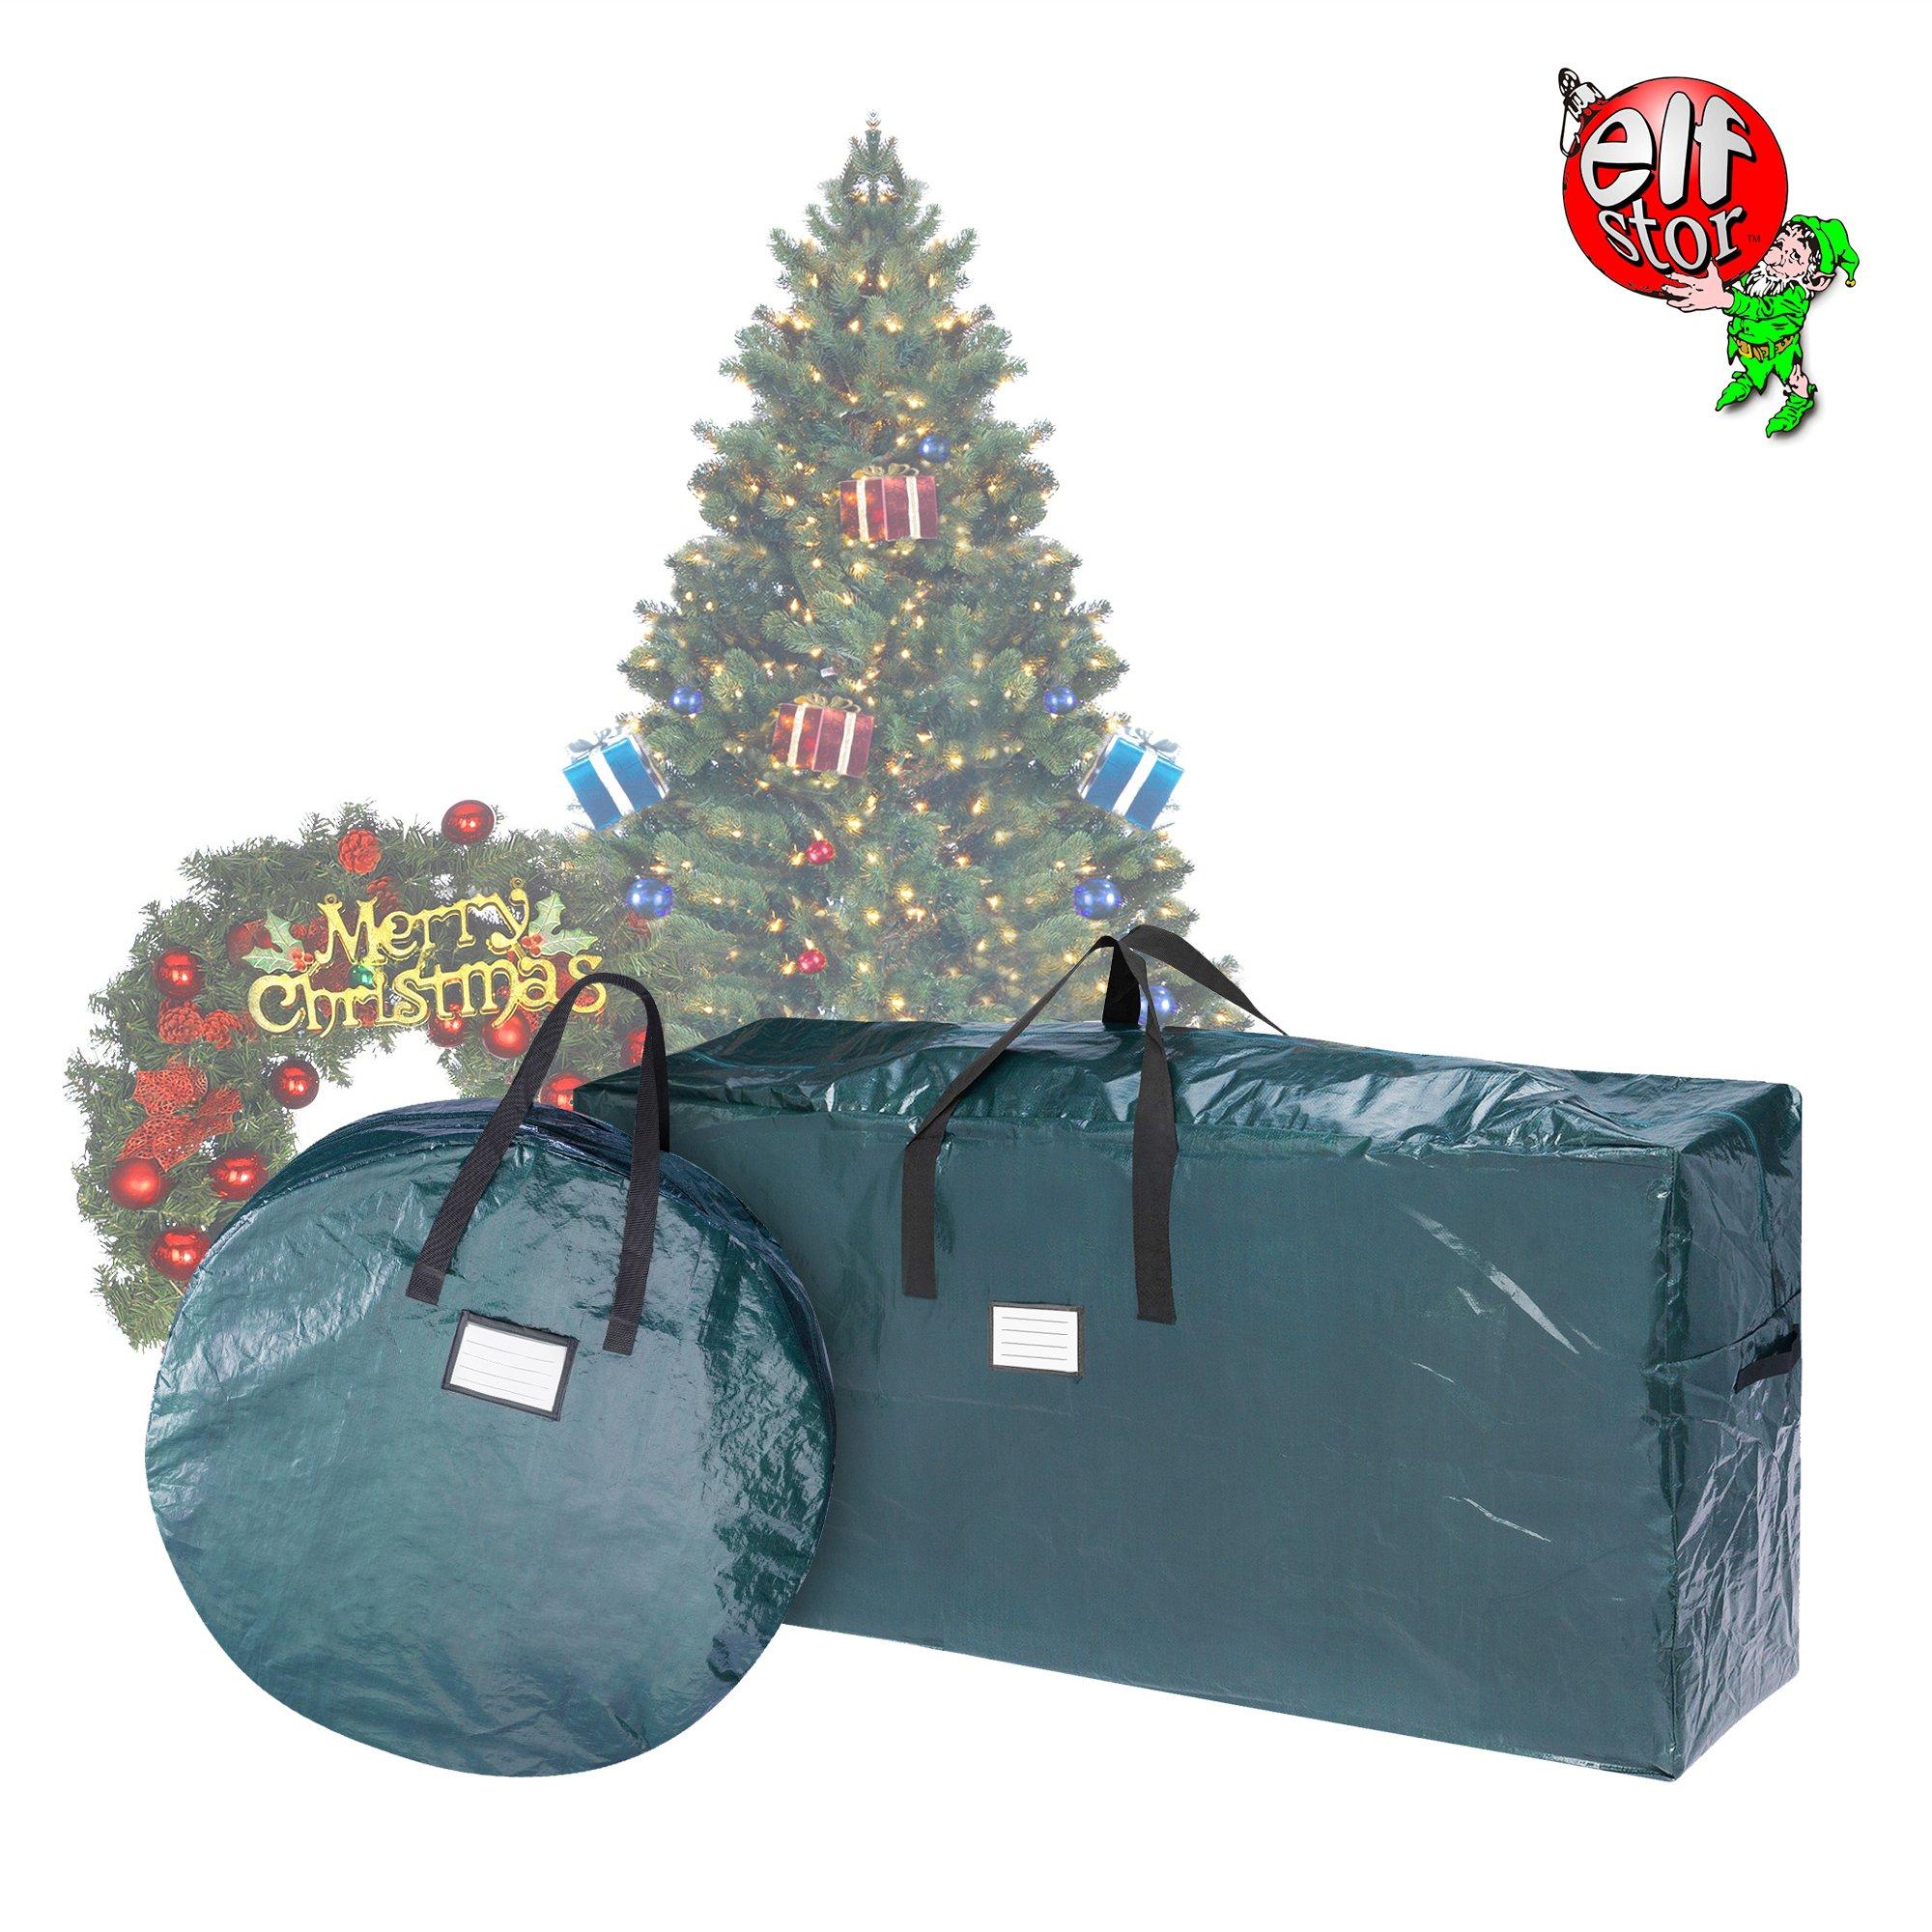 Elf Stor 83-DT5522 Combo | Christmas Tree Storage 30 inch Wreath Bag, Green